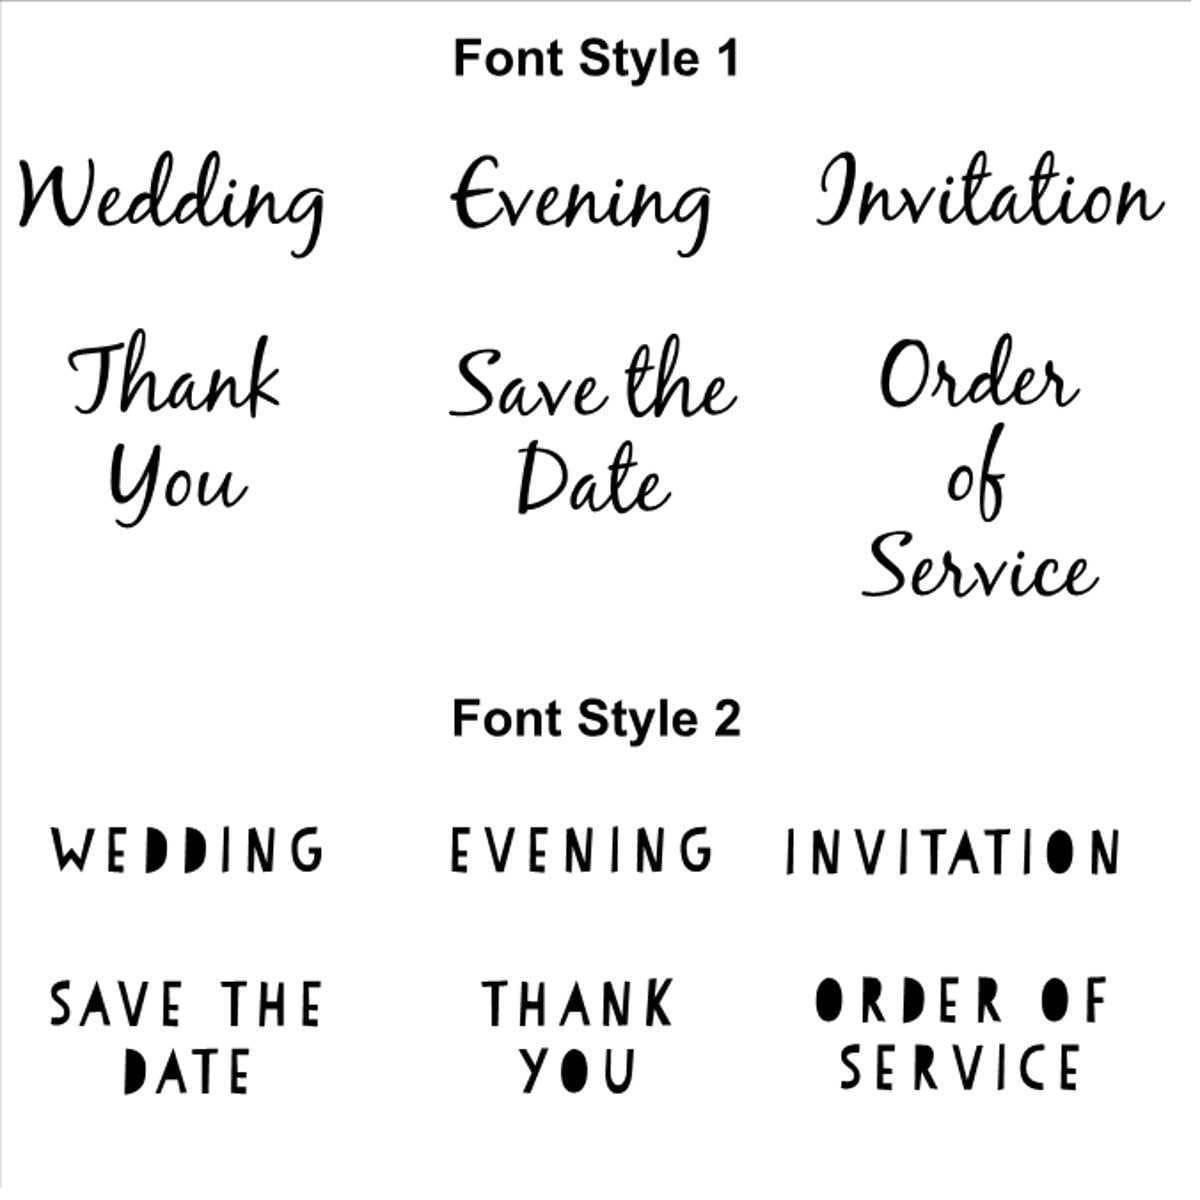 Wedding Invitation Rubber Stamps Various Fonts - DIY Bride Handmade ...